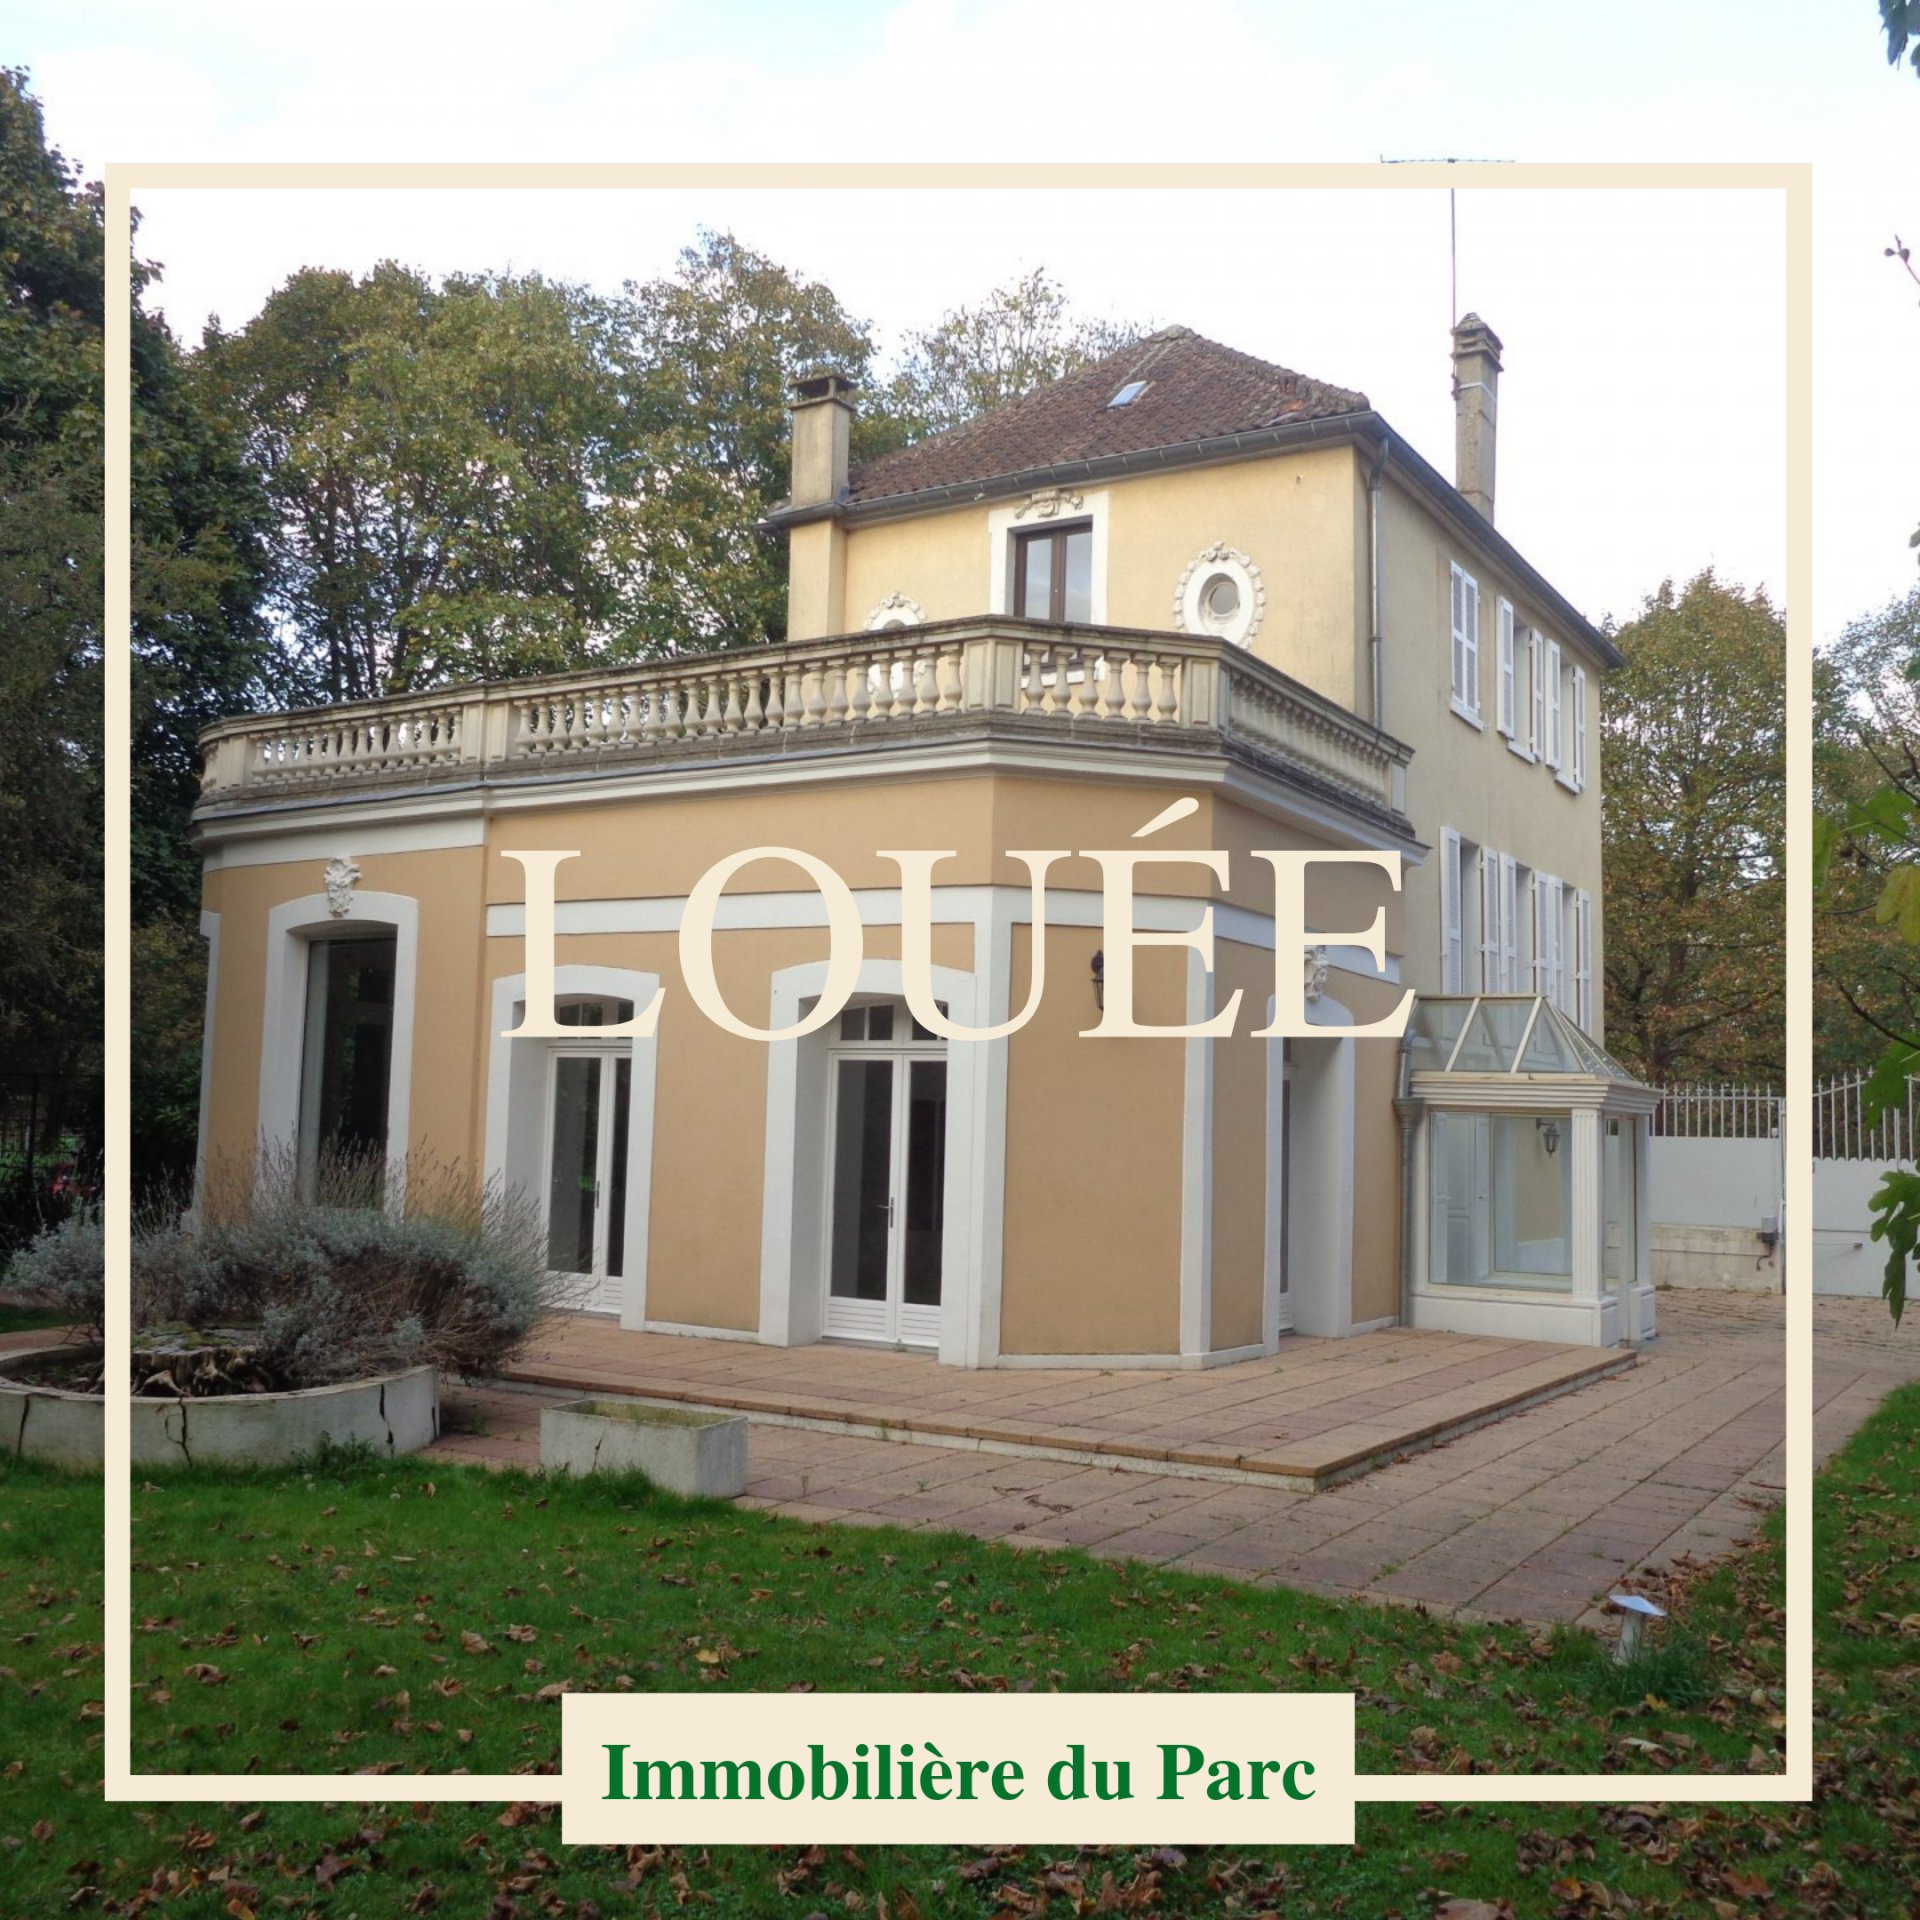 Location Maison - Saint-Germain-en-Laye